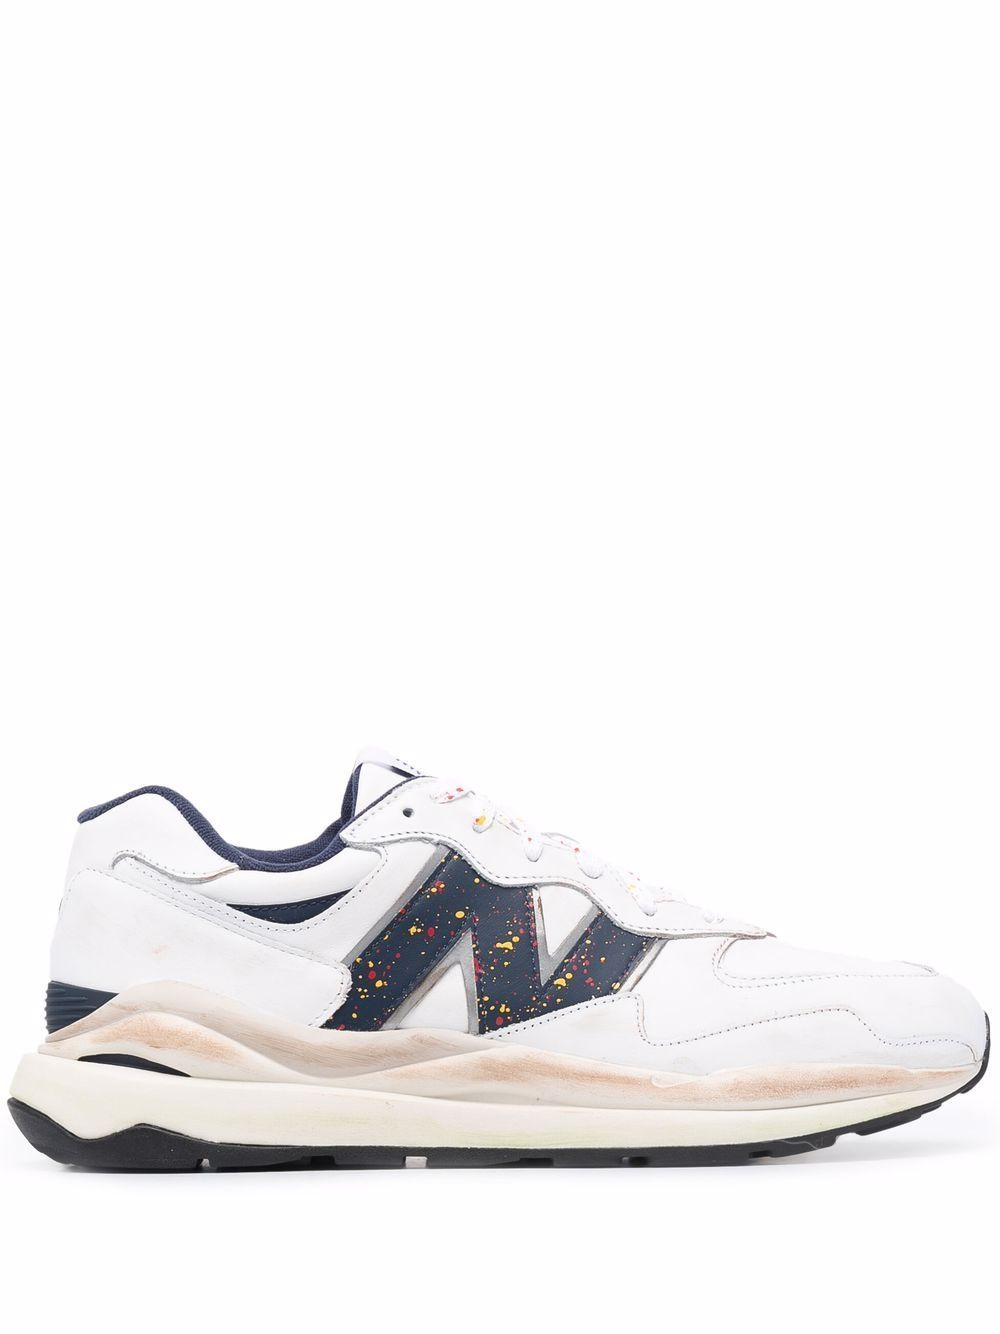 New balance sneakers bianco